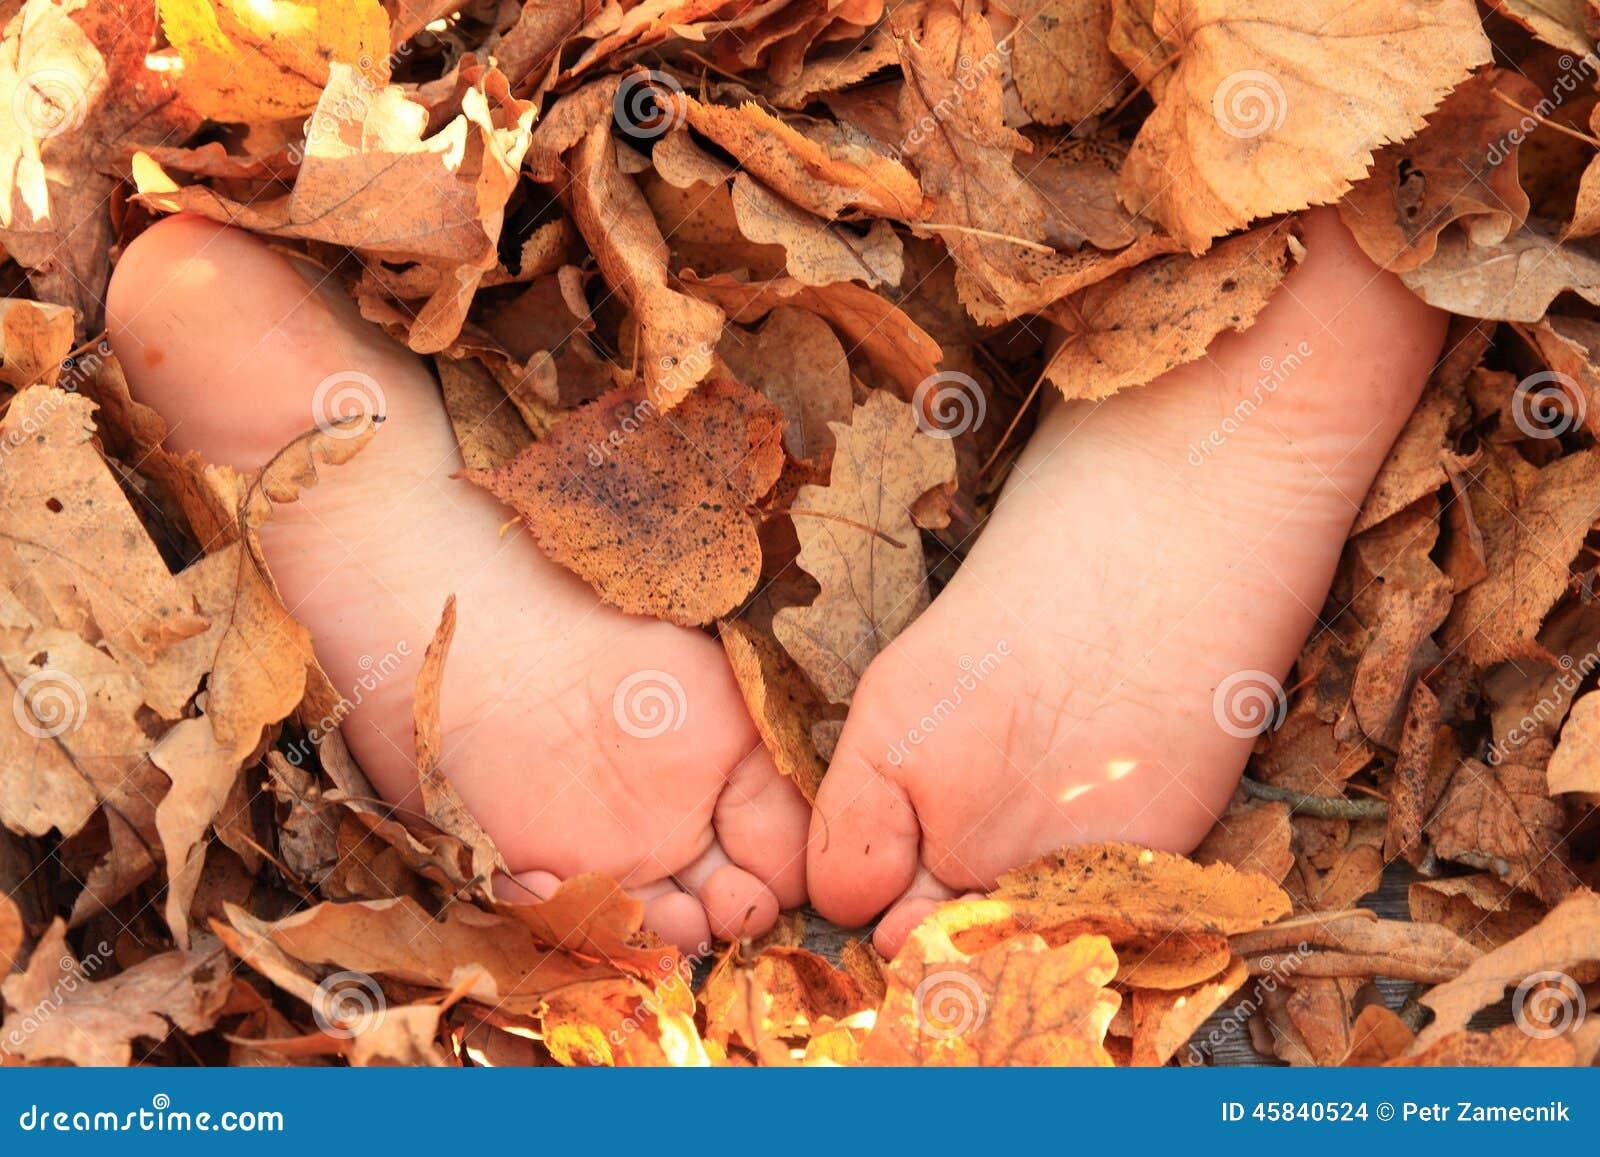 little girl bare toes